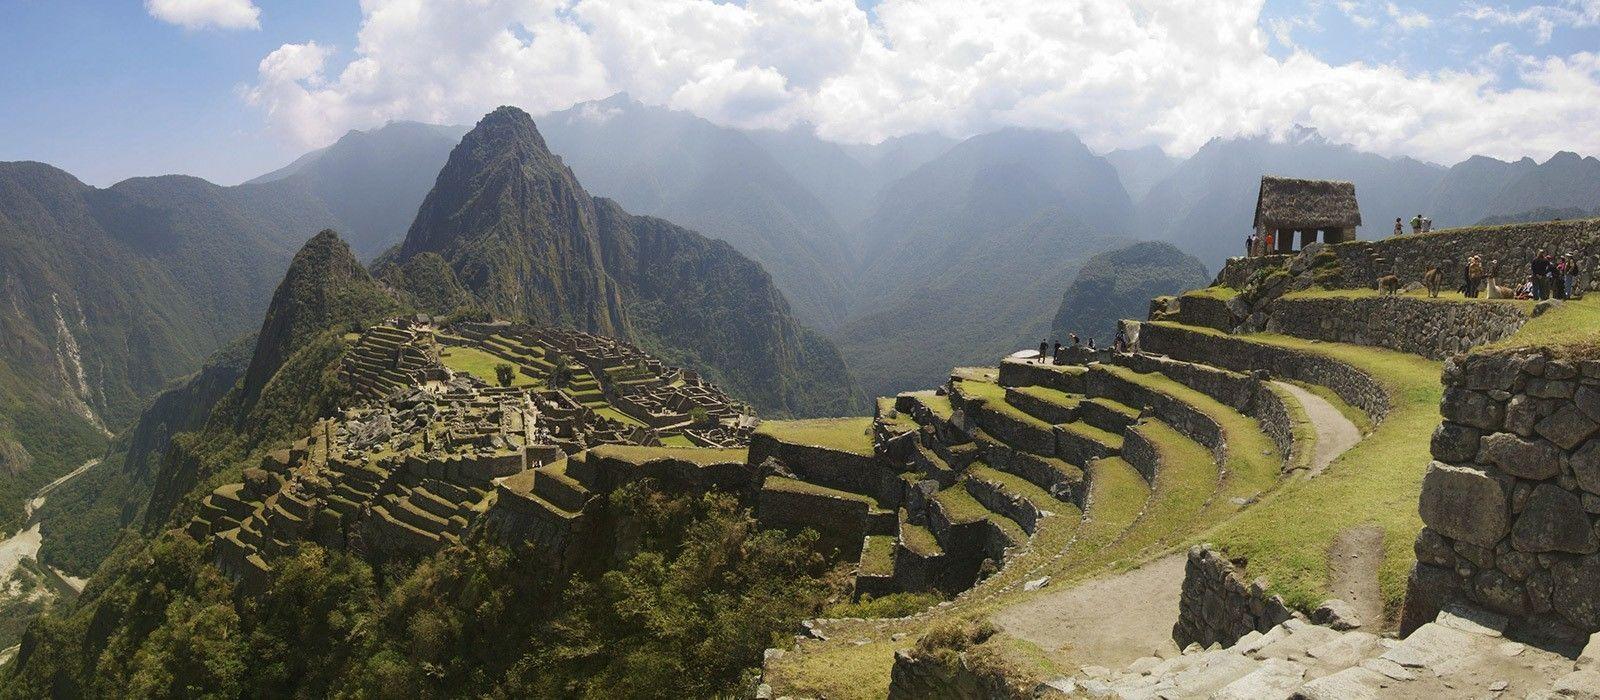 Peru: Highlights of the South Tour Trip 6